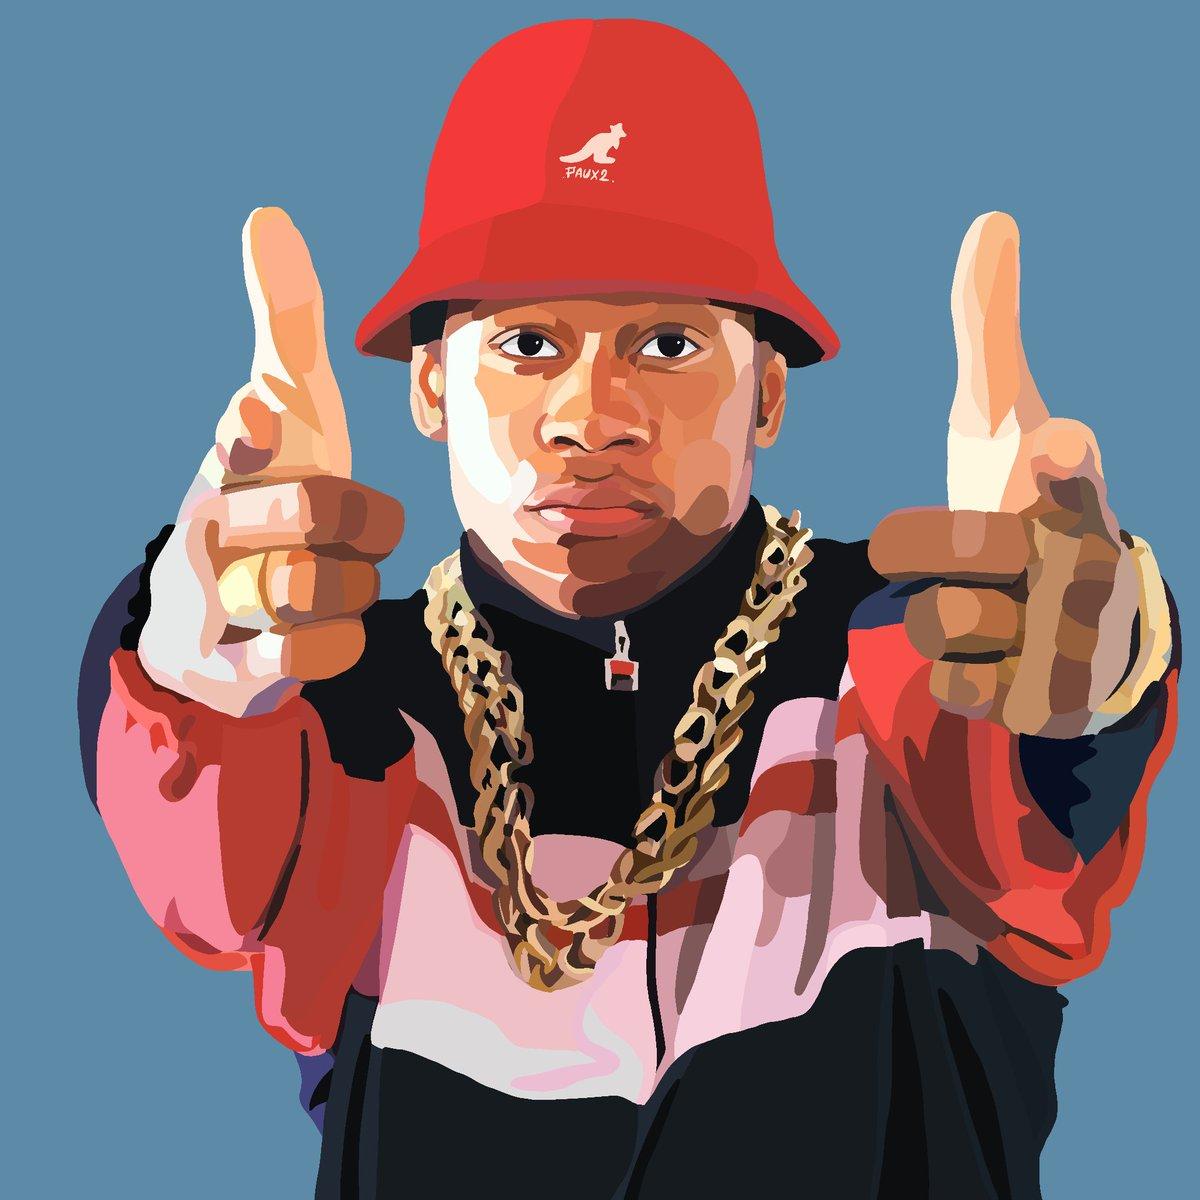 #llcoolj #oldschoolrap #hiphop #rap #oldschoolhiphop #shiphop #srap #oldschool #classichiphop #s #hiphopmusic #music #rapmusic #rapper #drdre #hiphopculture #undergroundrap #westcoasthiphop #pac #undergroundhiphop #classicrap #tupac #hiphophead #gangstarap #eastcoasthiphop #paux2pic.twitter.com/ZZ8iKmLxKE